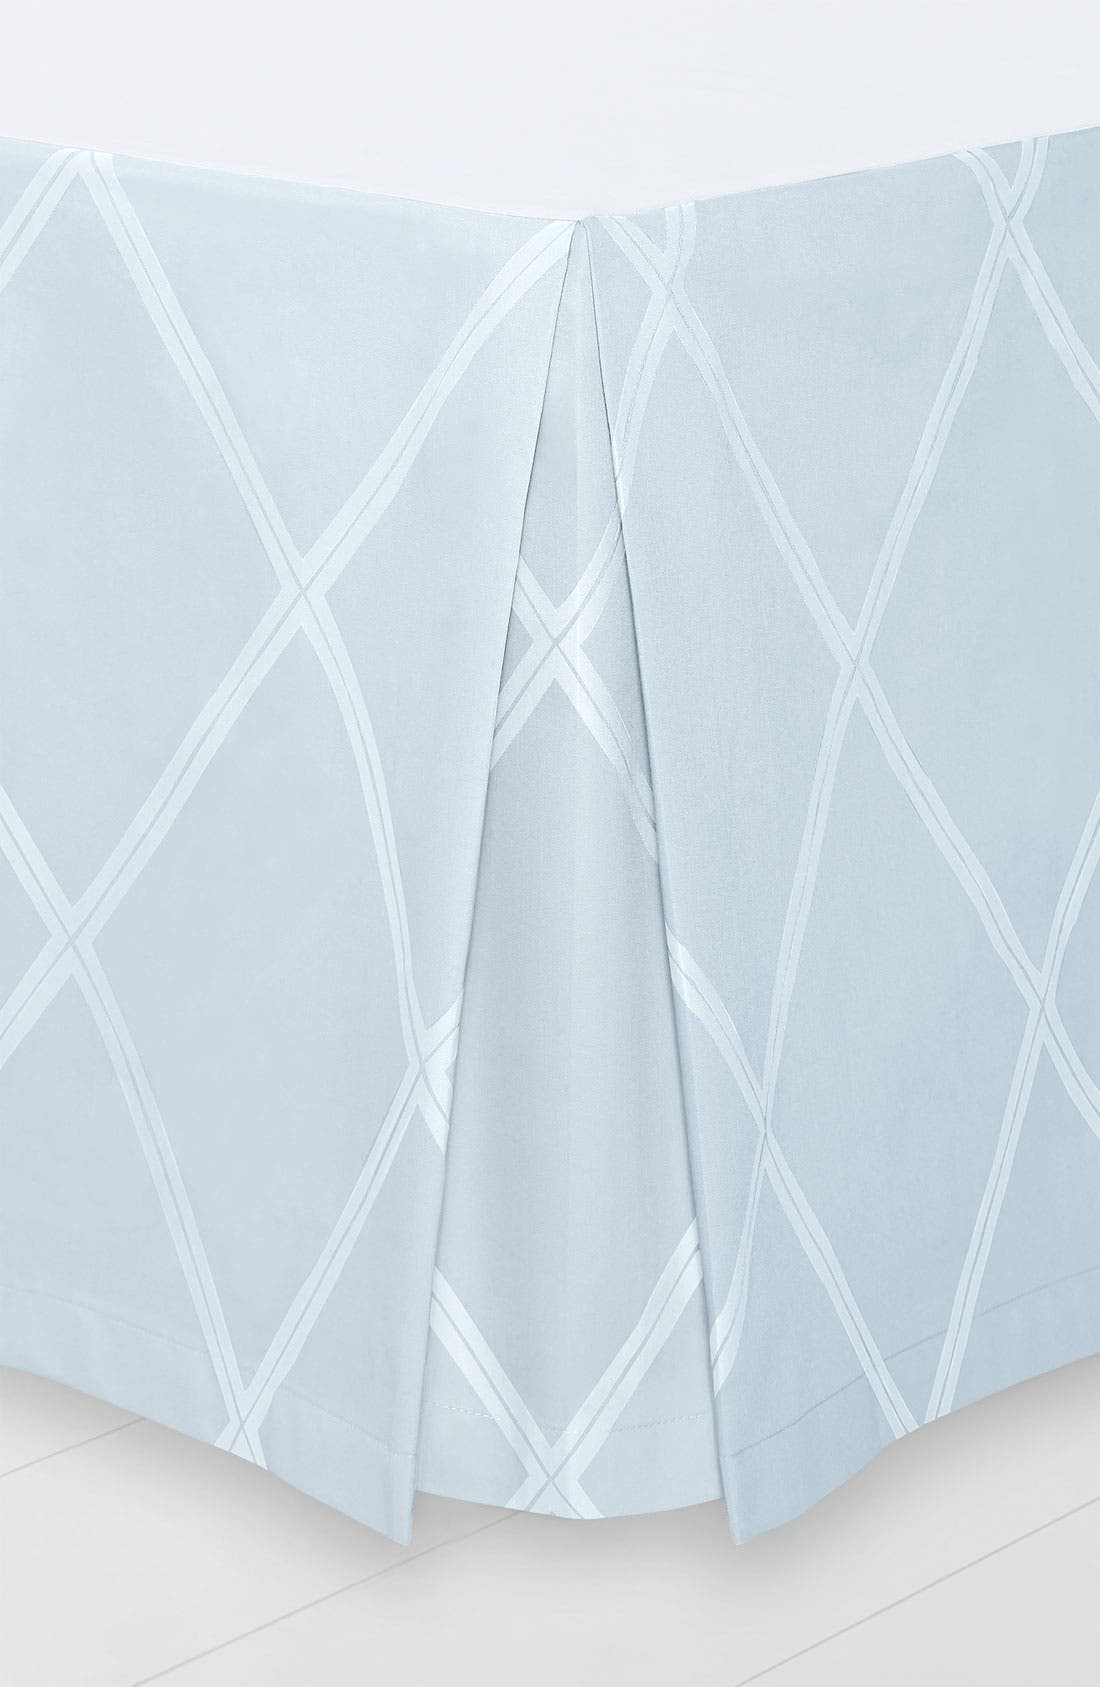 Alternate Image 1 Selected - kate spade new york 'magnolia park' bed skirt